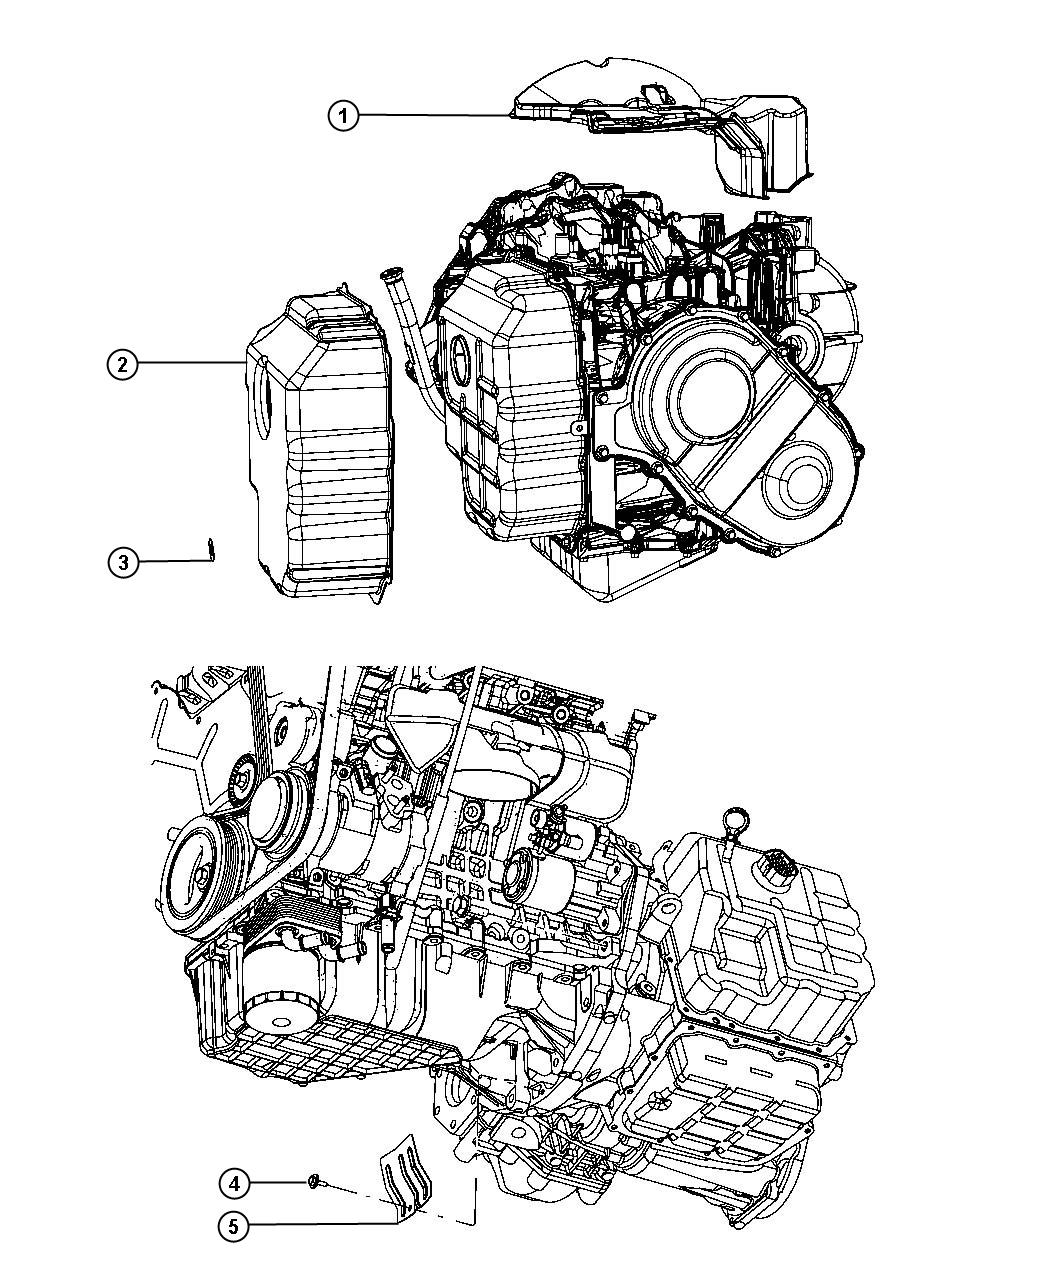 Chrysler 200 Shield Transmission Vehicles Used